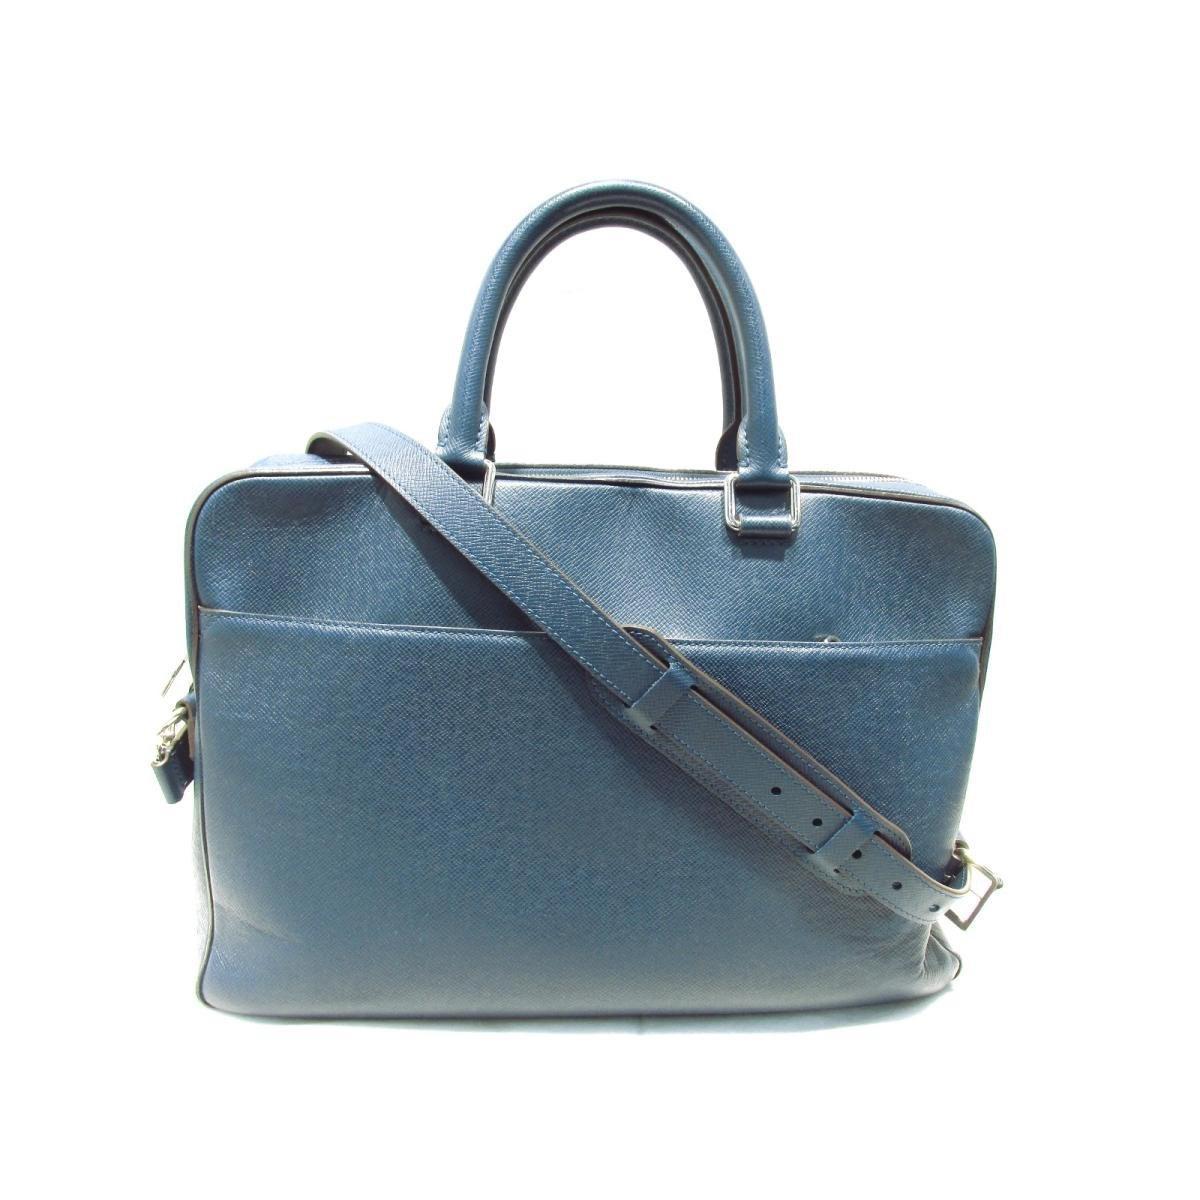 ba54002ea Gallery. Previously sold at: Reebonz · Men's Givenchy Nightingale Men's Louis  Vuitton ...